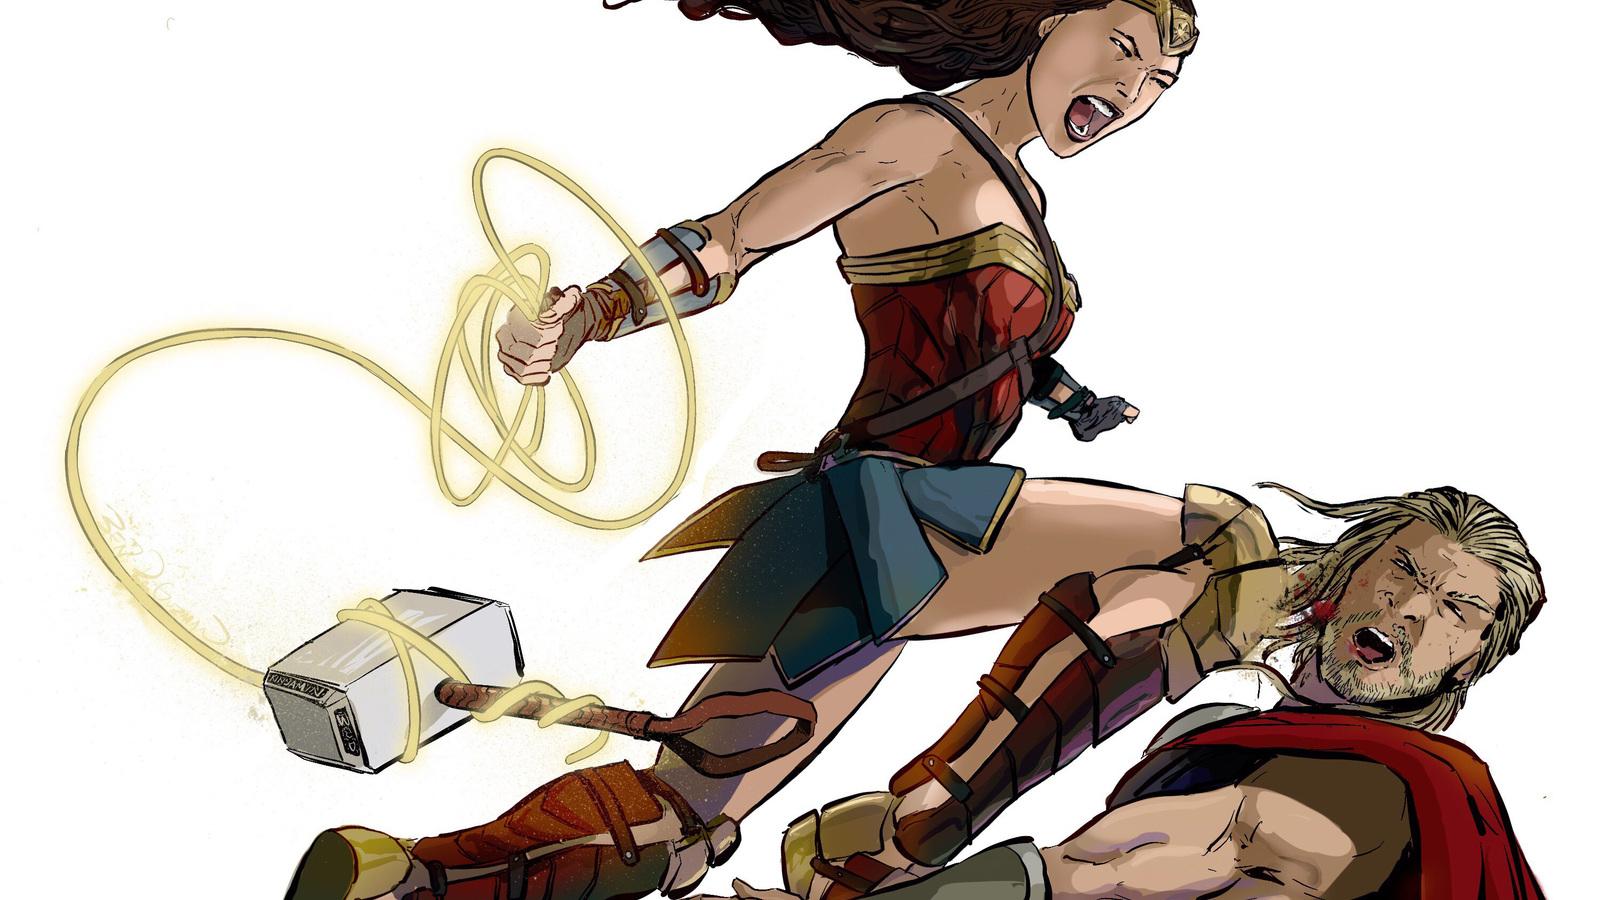 wonder-woman-defeating-thor-c3.jpg